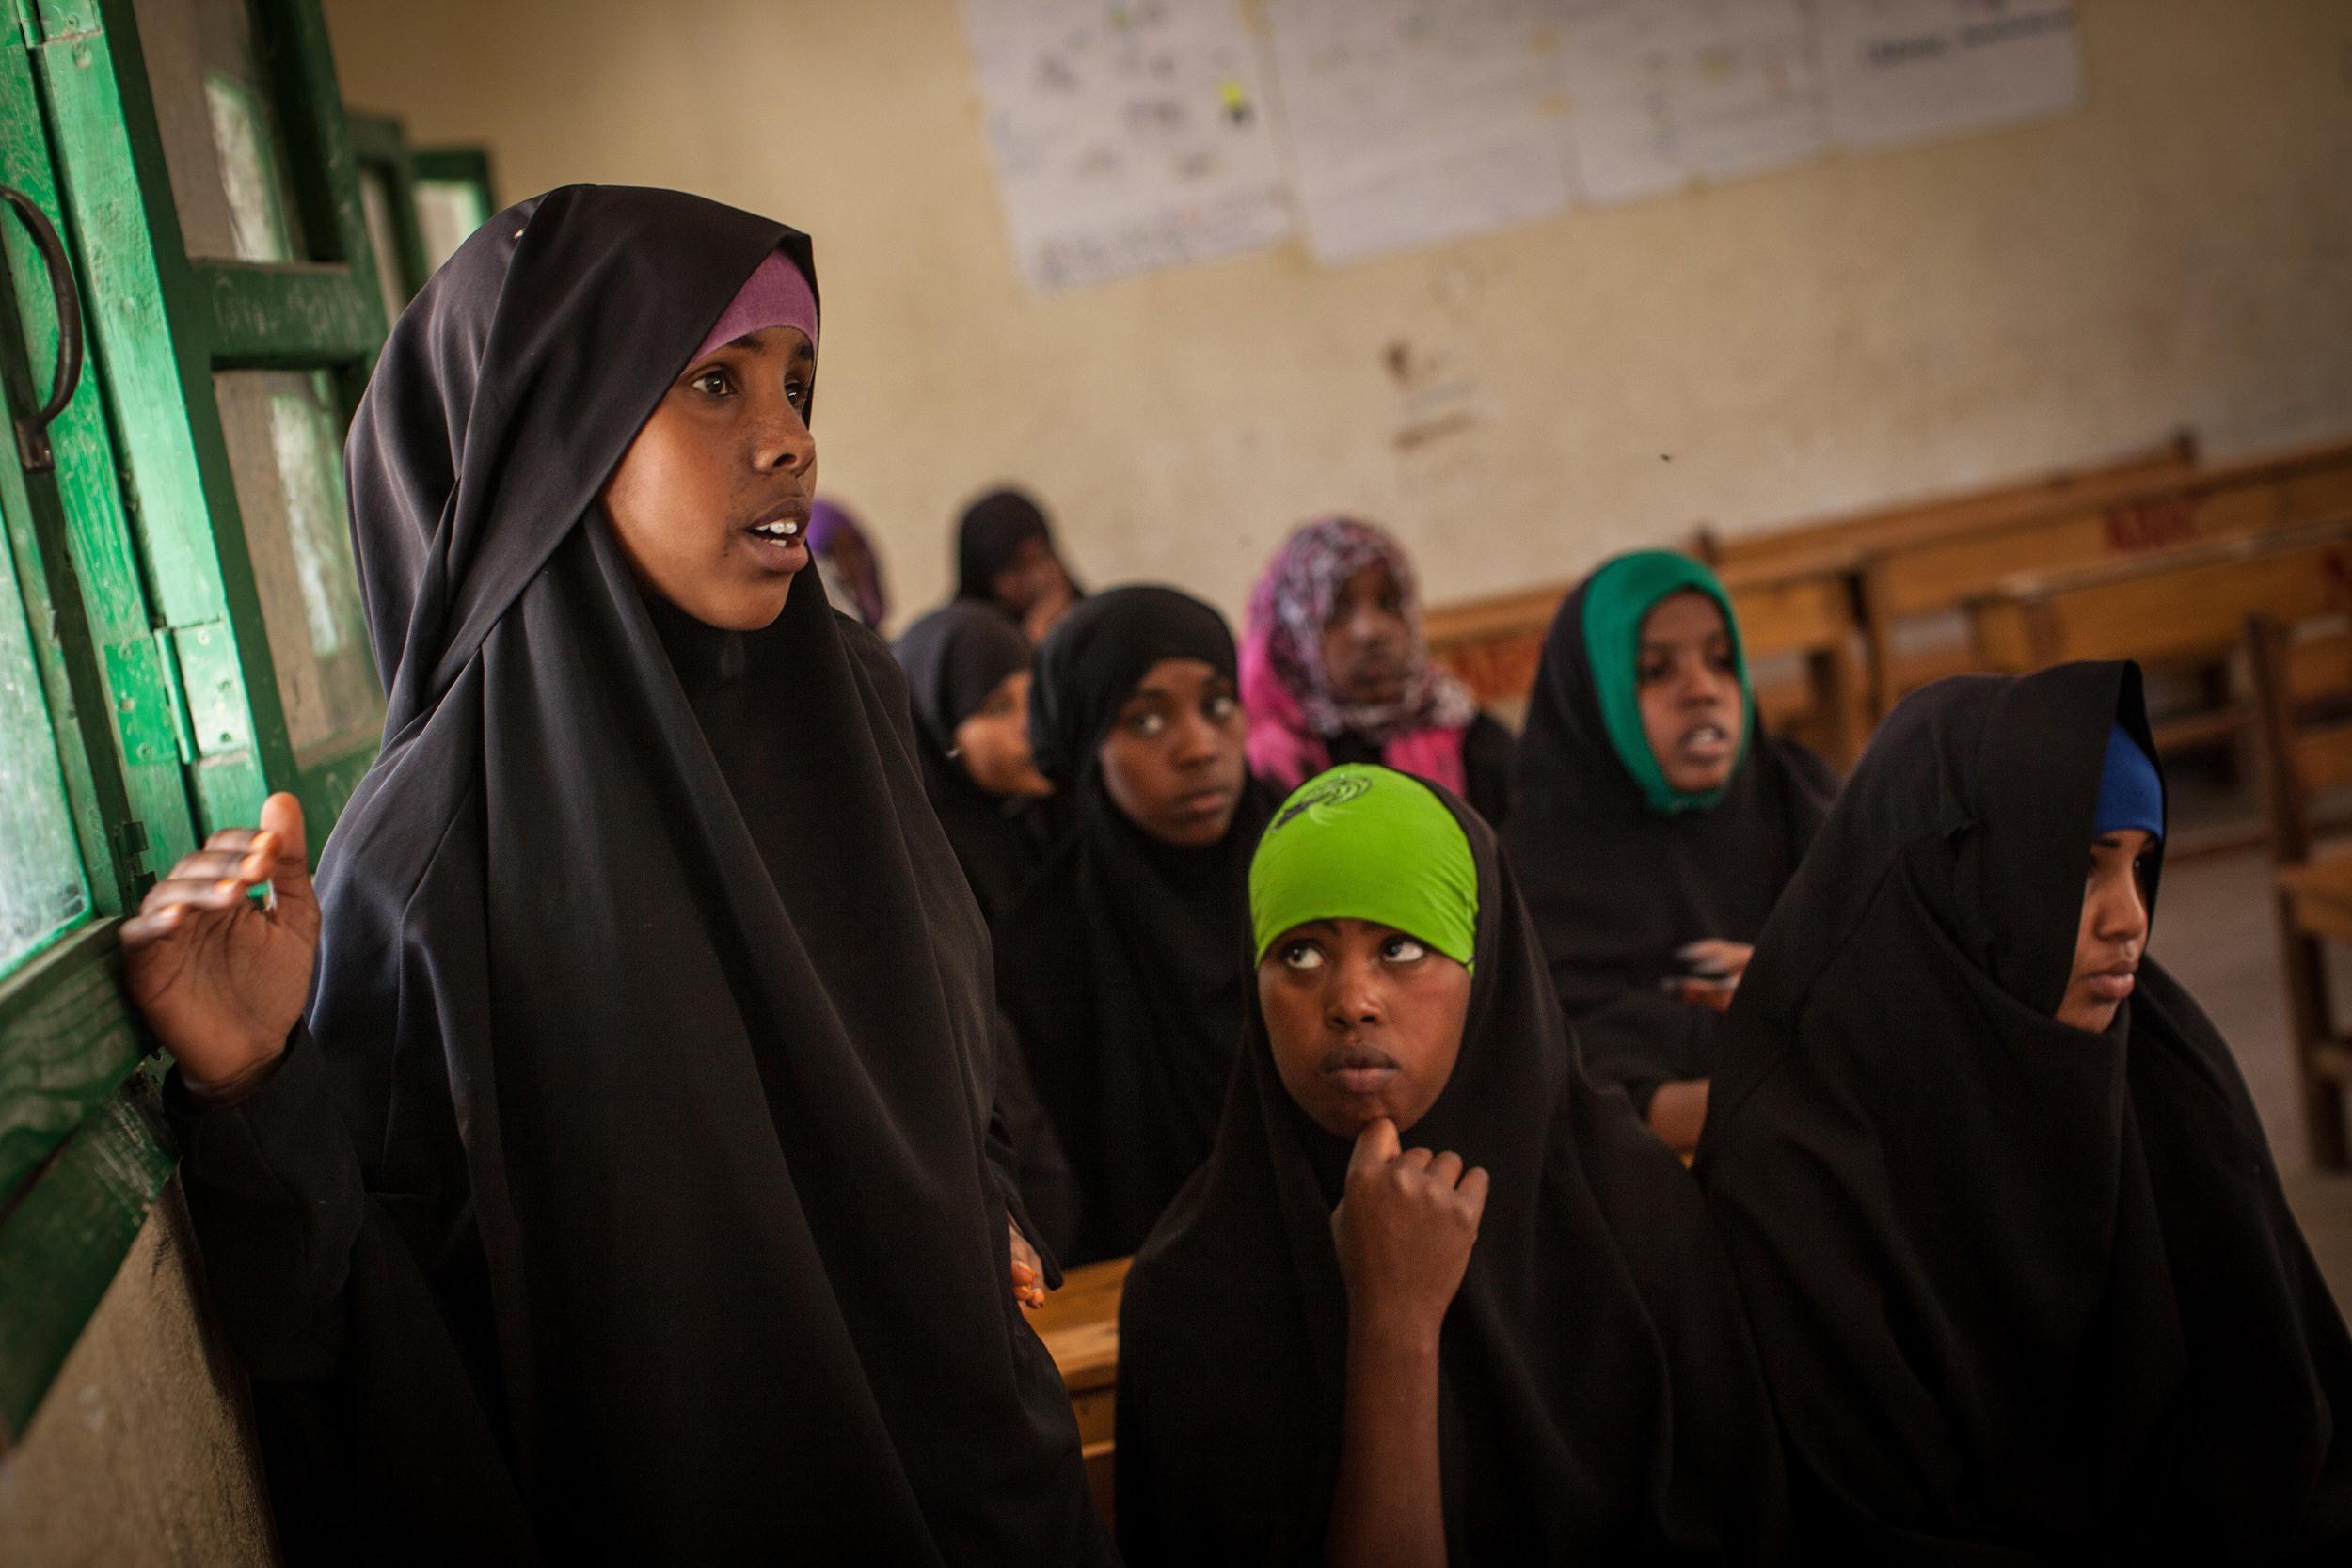 Image: SOMALIA-HEALTH-RIGHTS-WOMEN-FGM